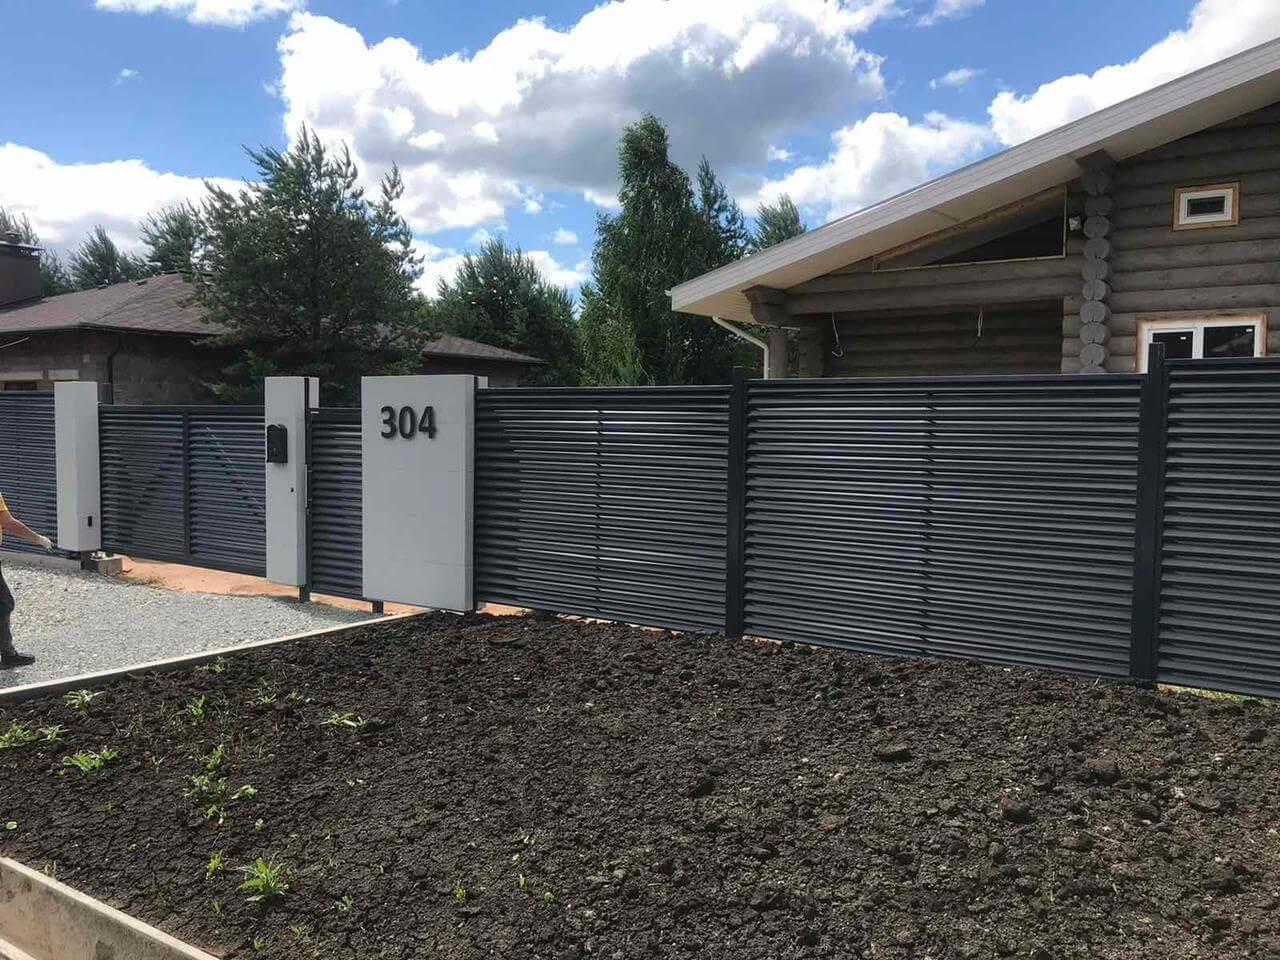 забор-жалюзи ЭКО-Z серый графит фото1